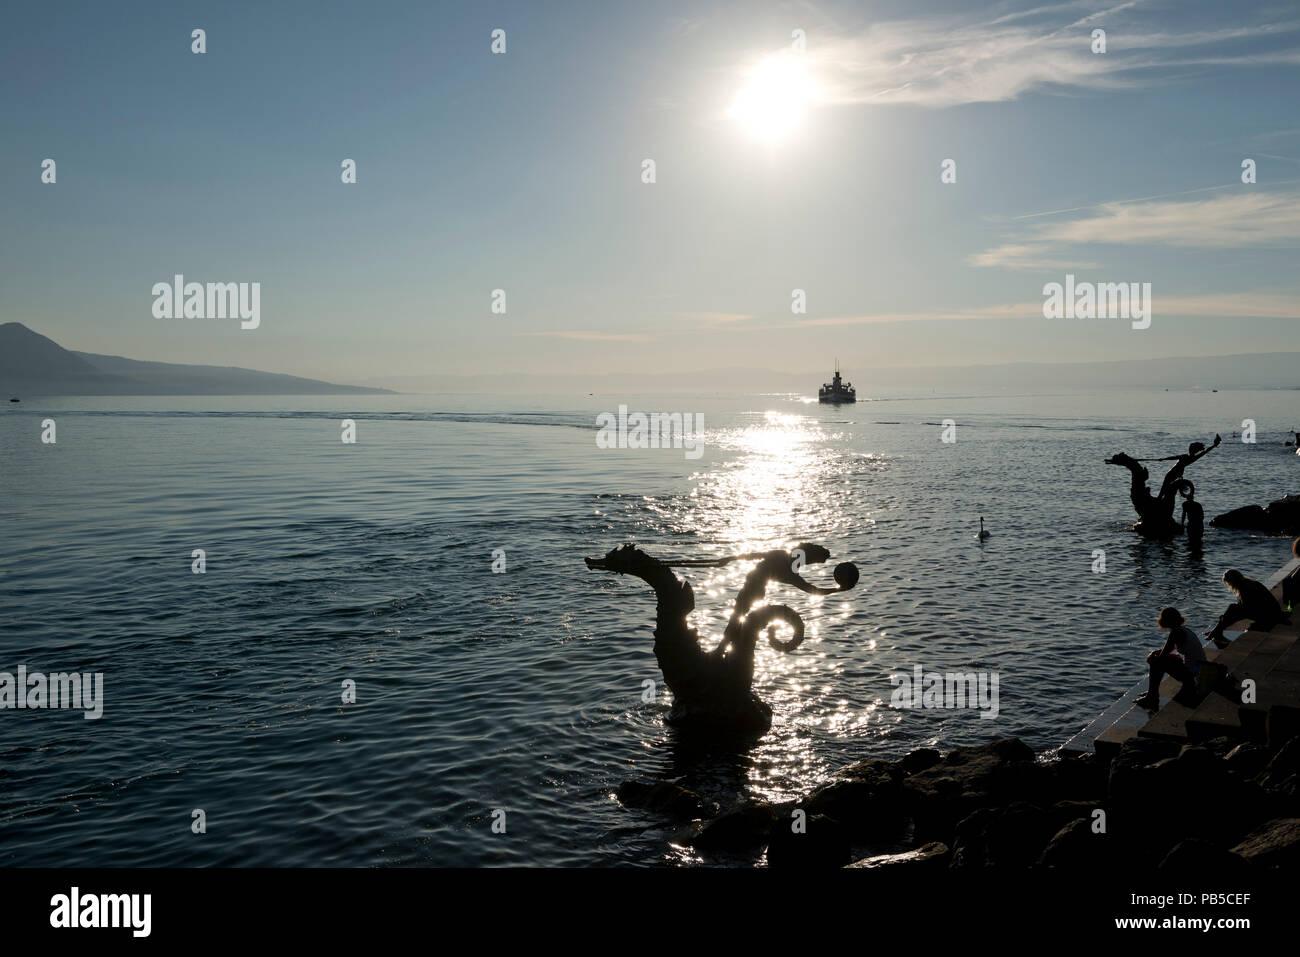 Switzerland, Vaud, Waadt, Vevey, CGN, bateau, Schiff, boat